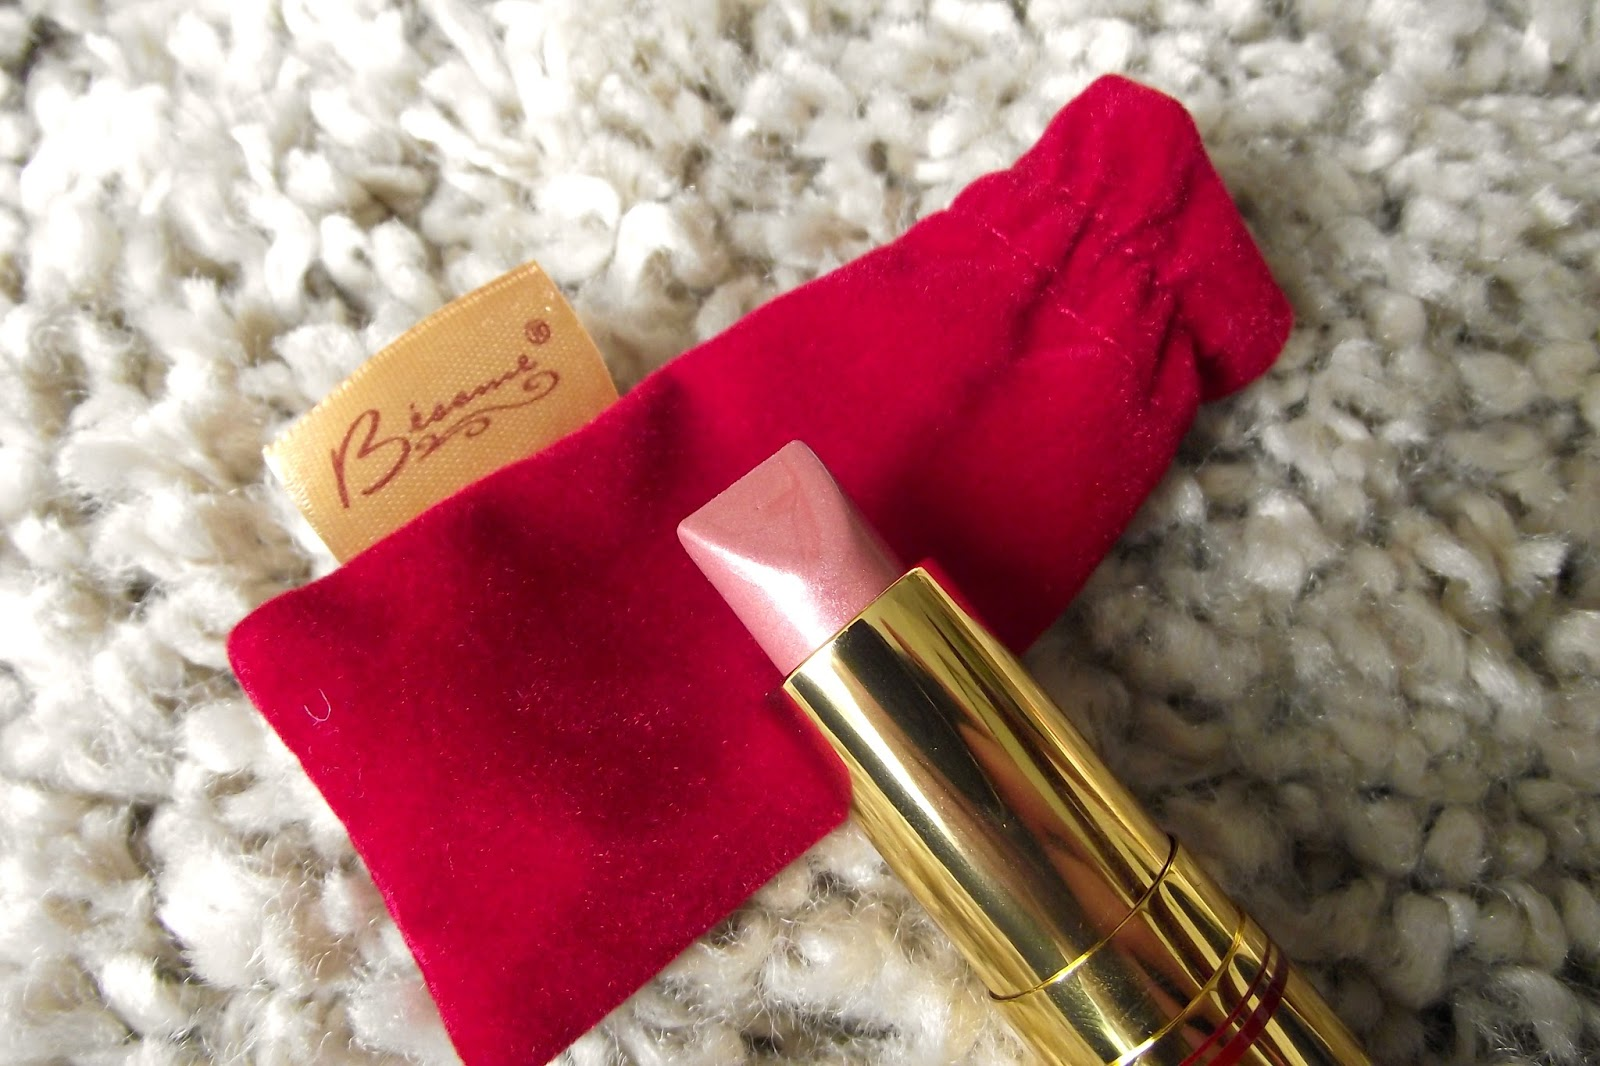 Besame Champagne Lipstick